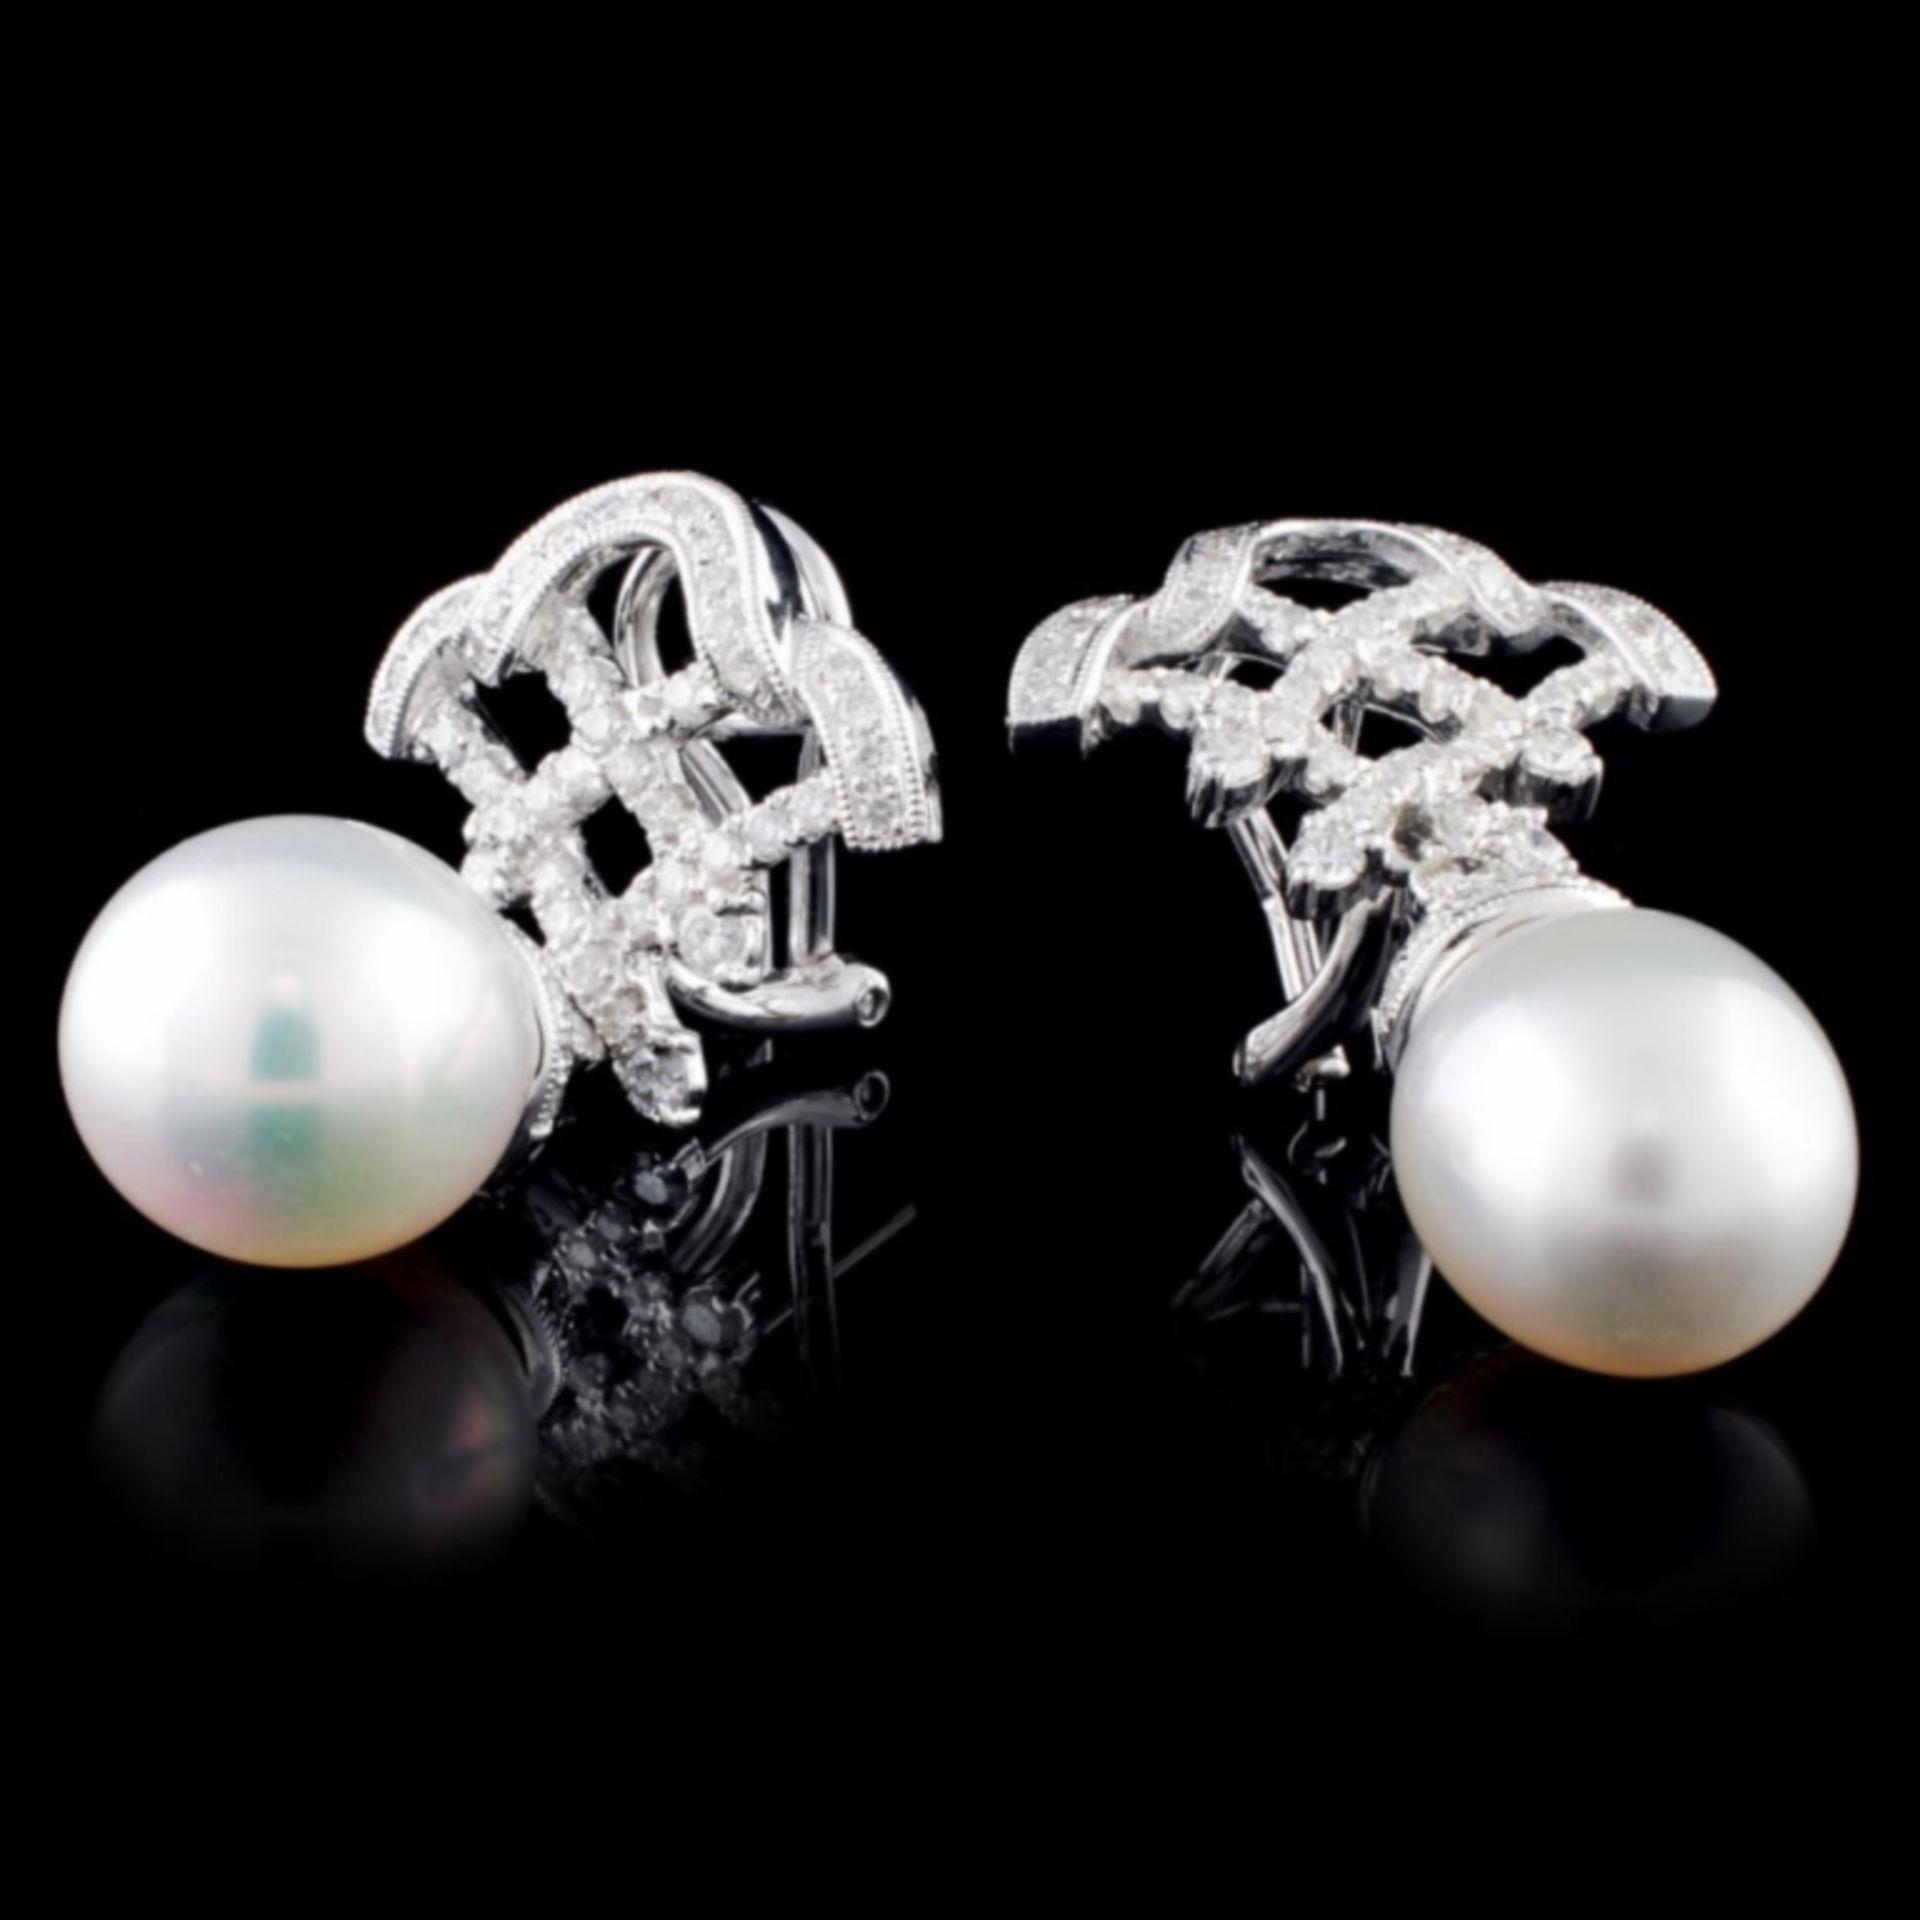 14K Gold 12.00mm Pearl & 1.12ctw Diamond Earrings - Image 2 of 2